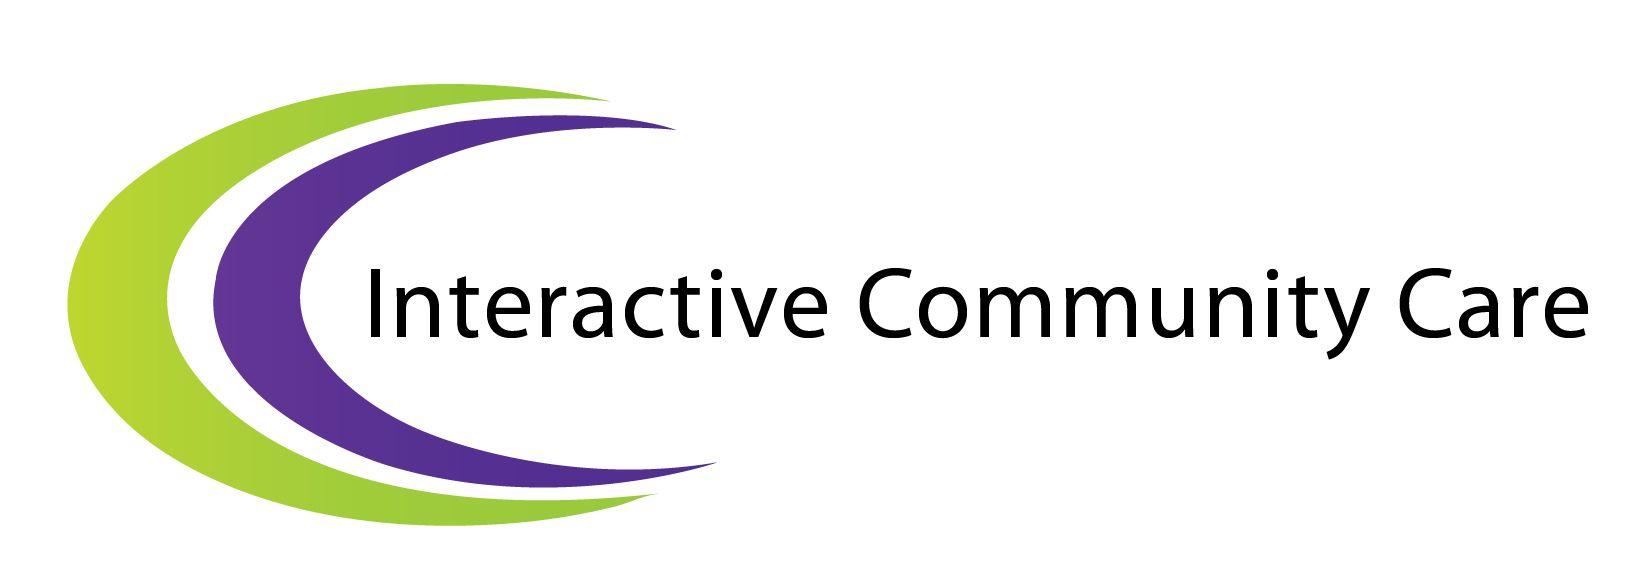 interactice care ICCARE Logo RGB (Print)